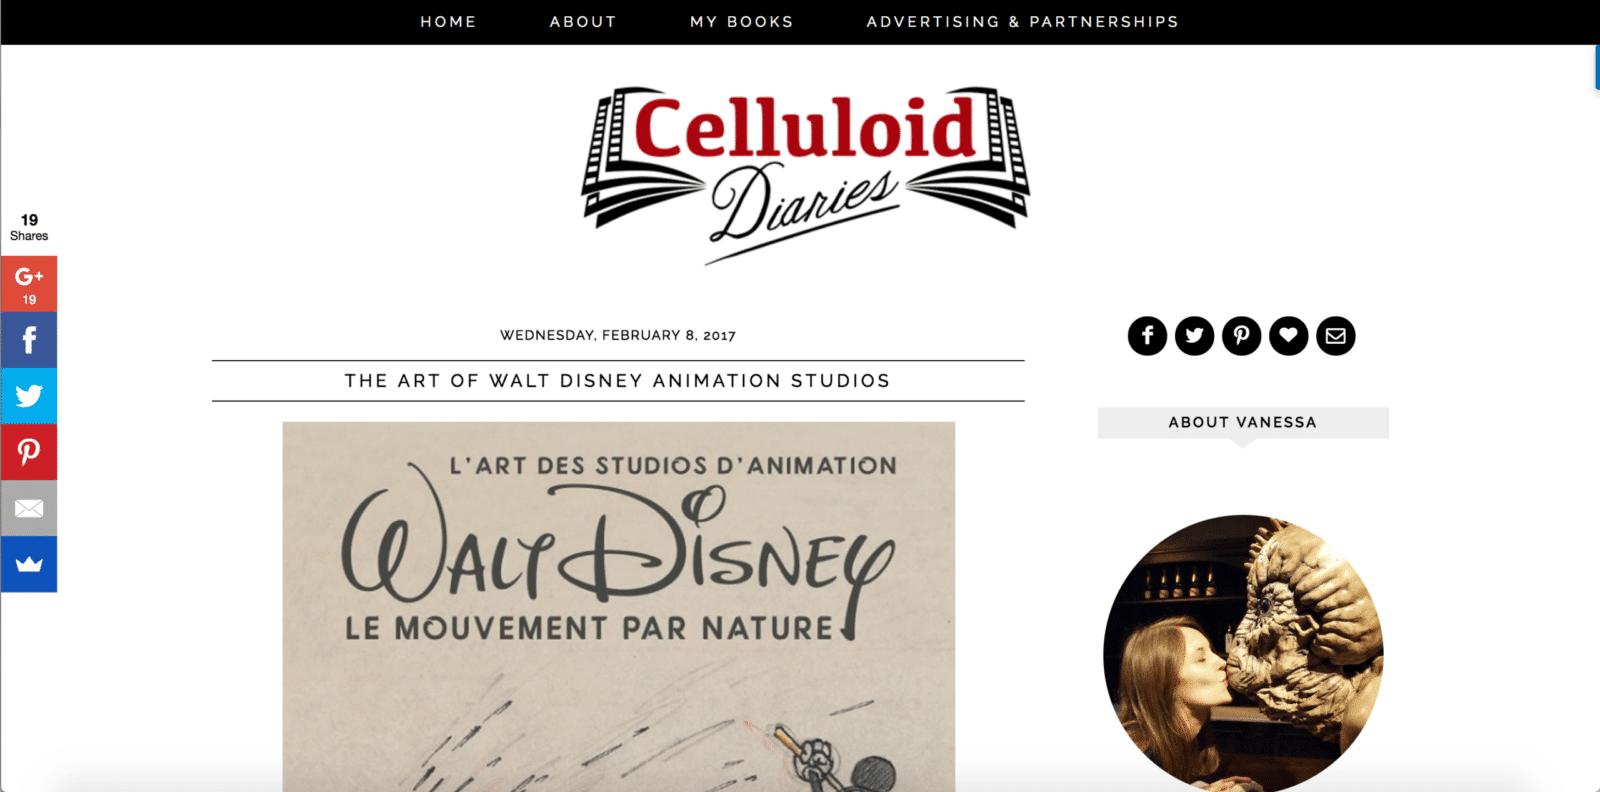 celluloid-diaries